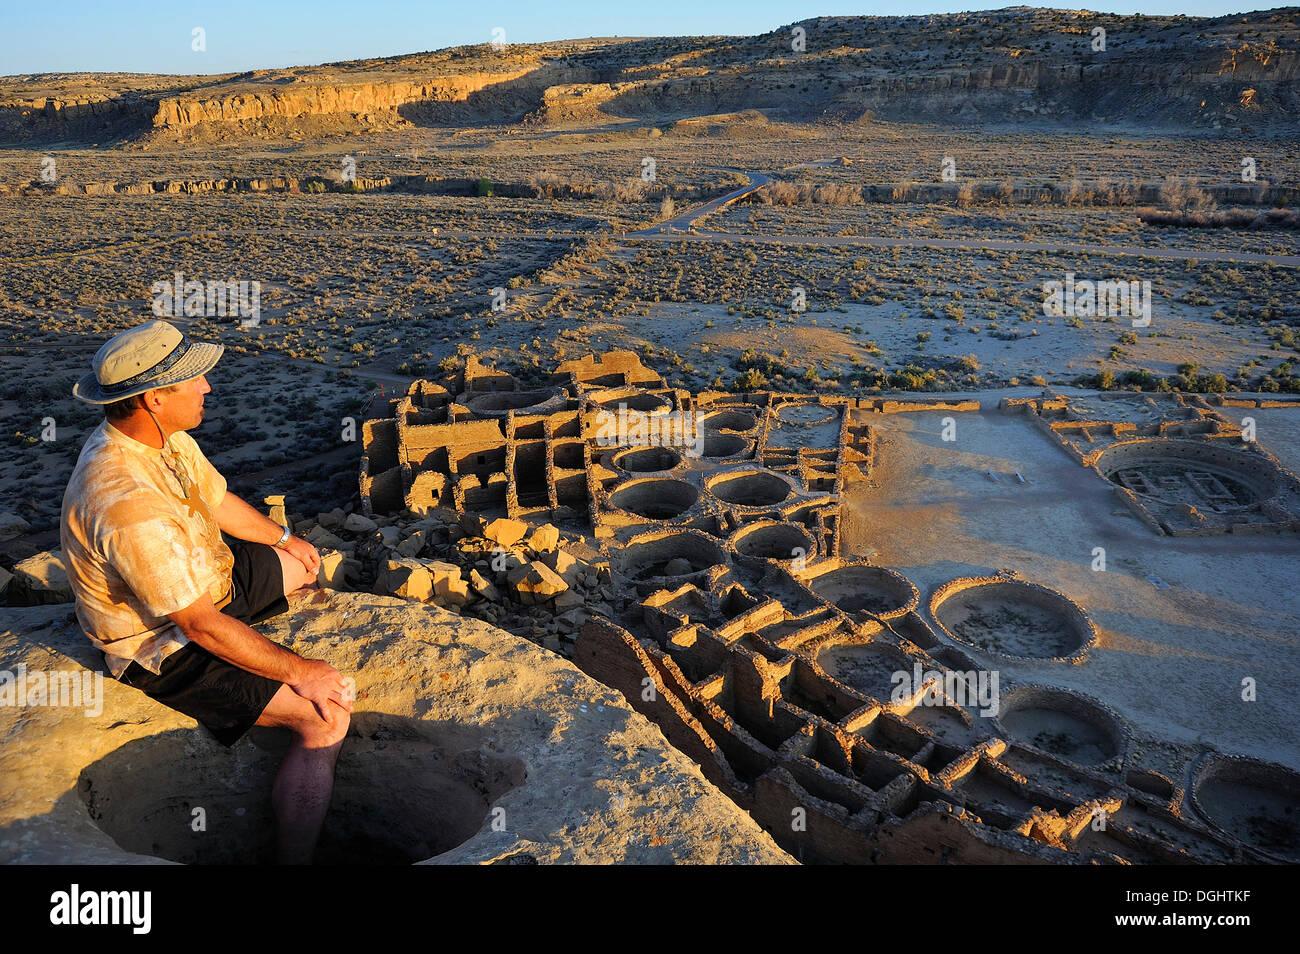 Man enjoying view of Pueblo Bonito, Chaco Canyon National Monument, New Mexico, USA - Stock Image